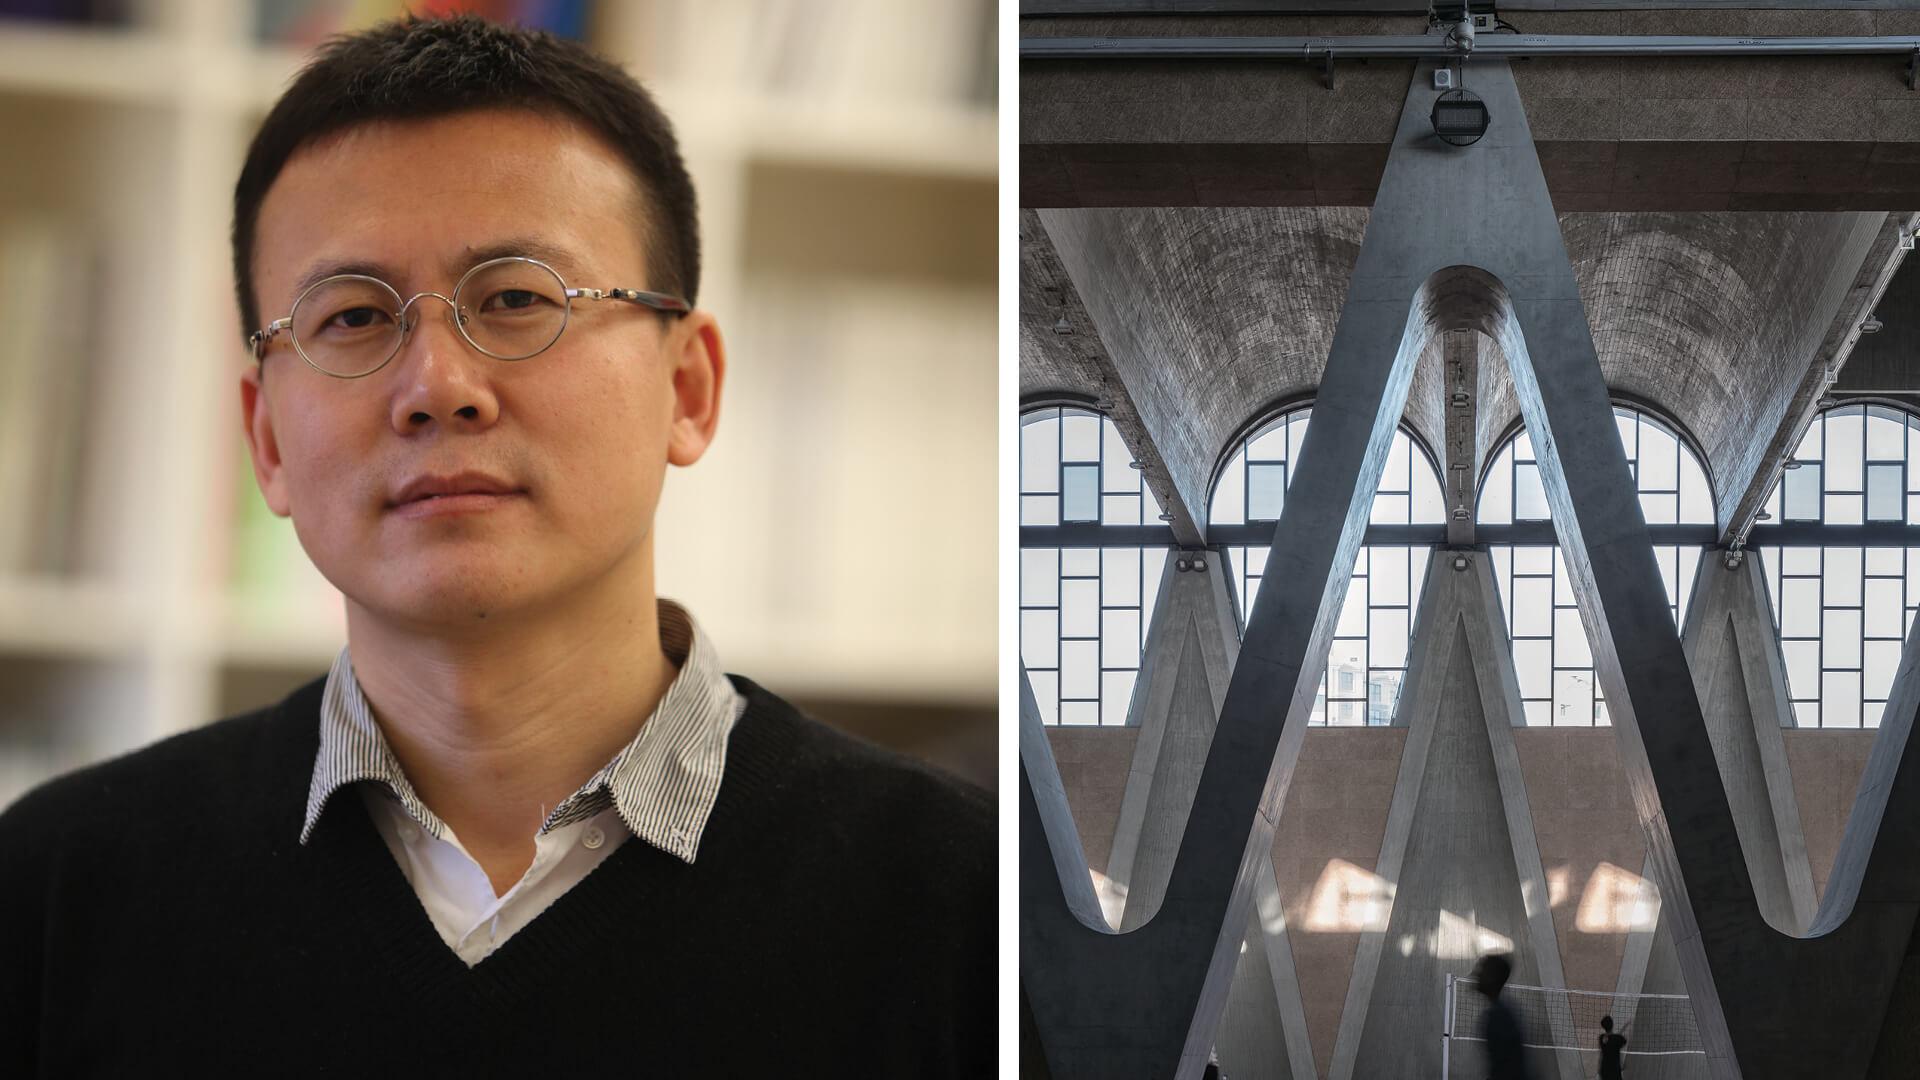 Left: Portrait of Li Xinggang; Right: Gymnasium of New Campus of Tianjin University - Hall 2 and Hall 1 | Gymnasium at the New Campus of Tianjin University | Li Xinggang | STIRworld